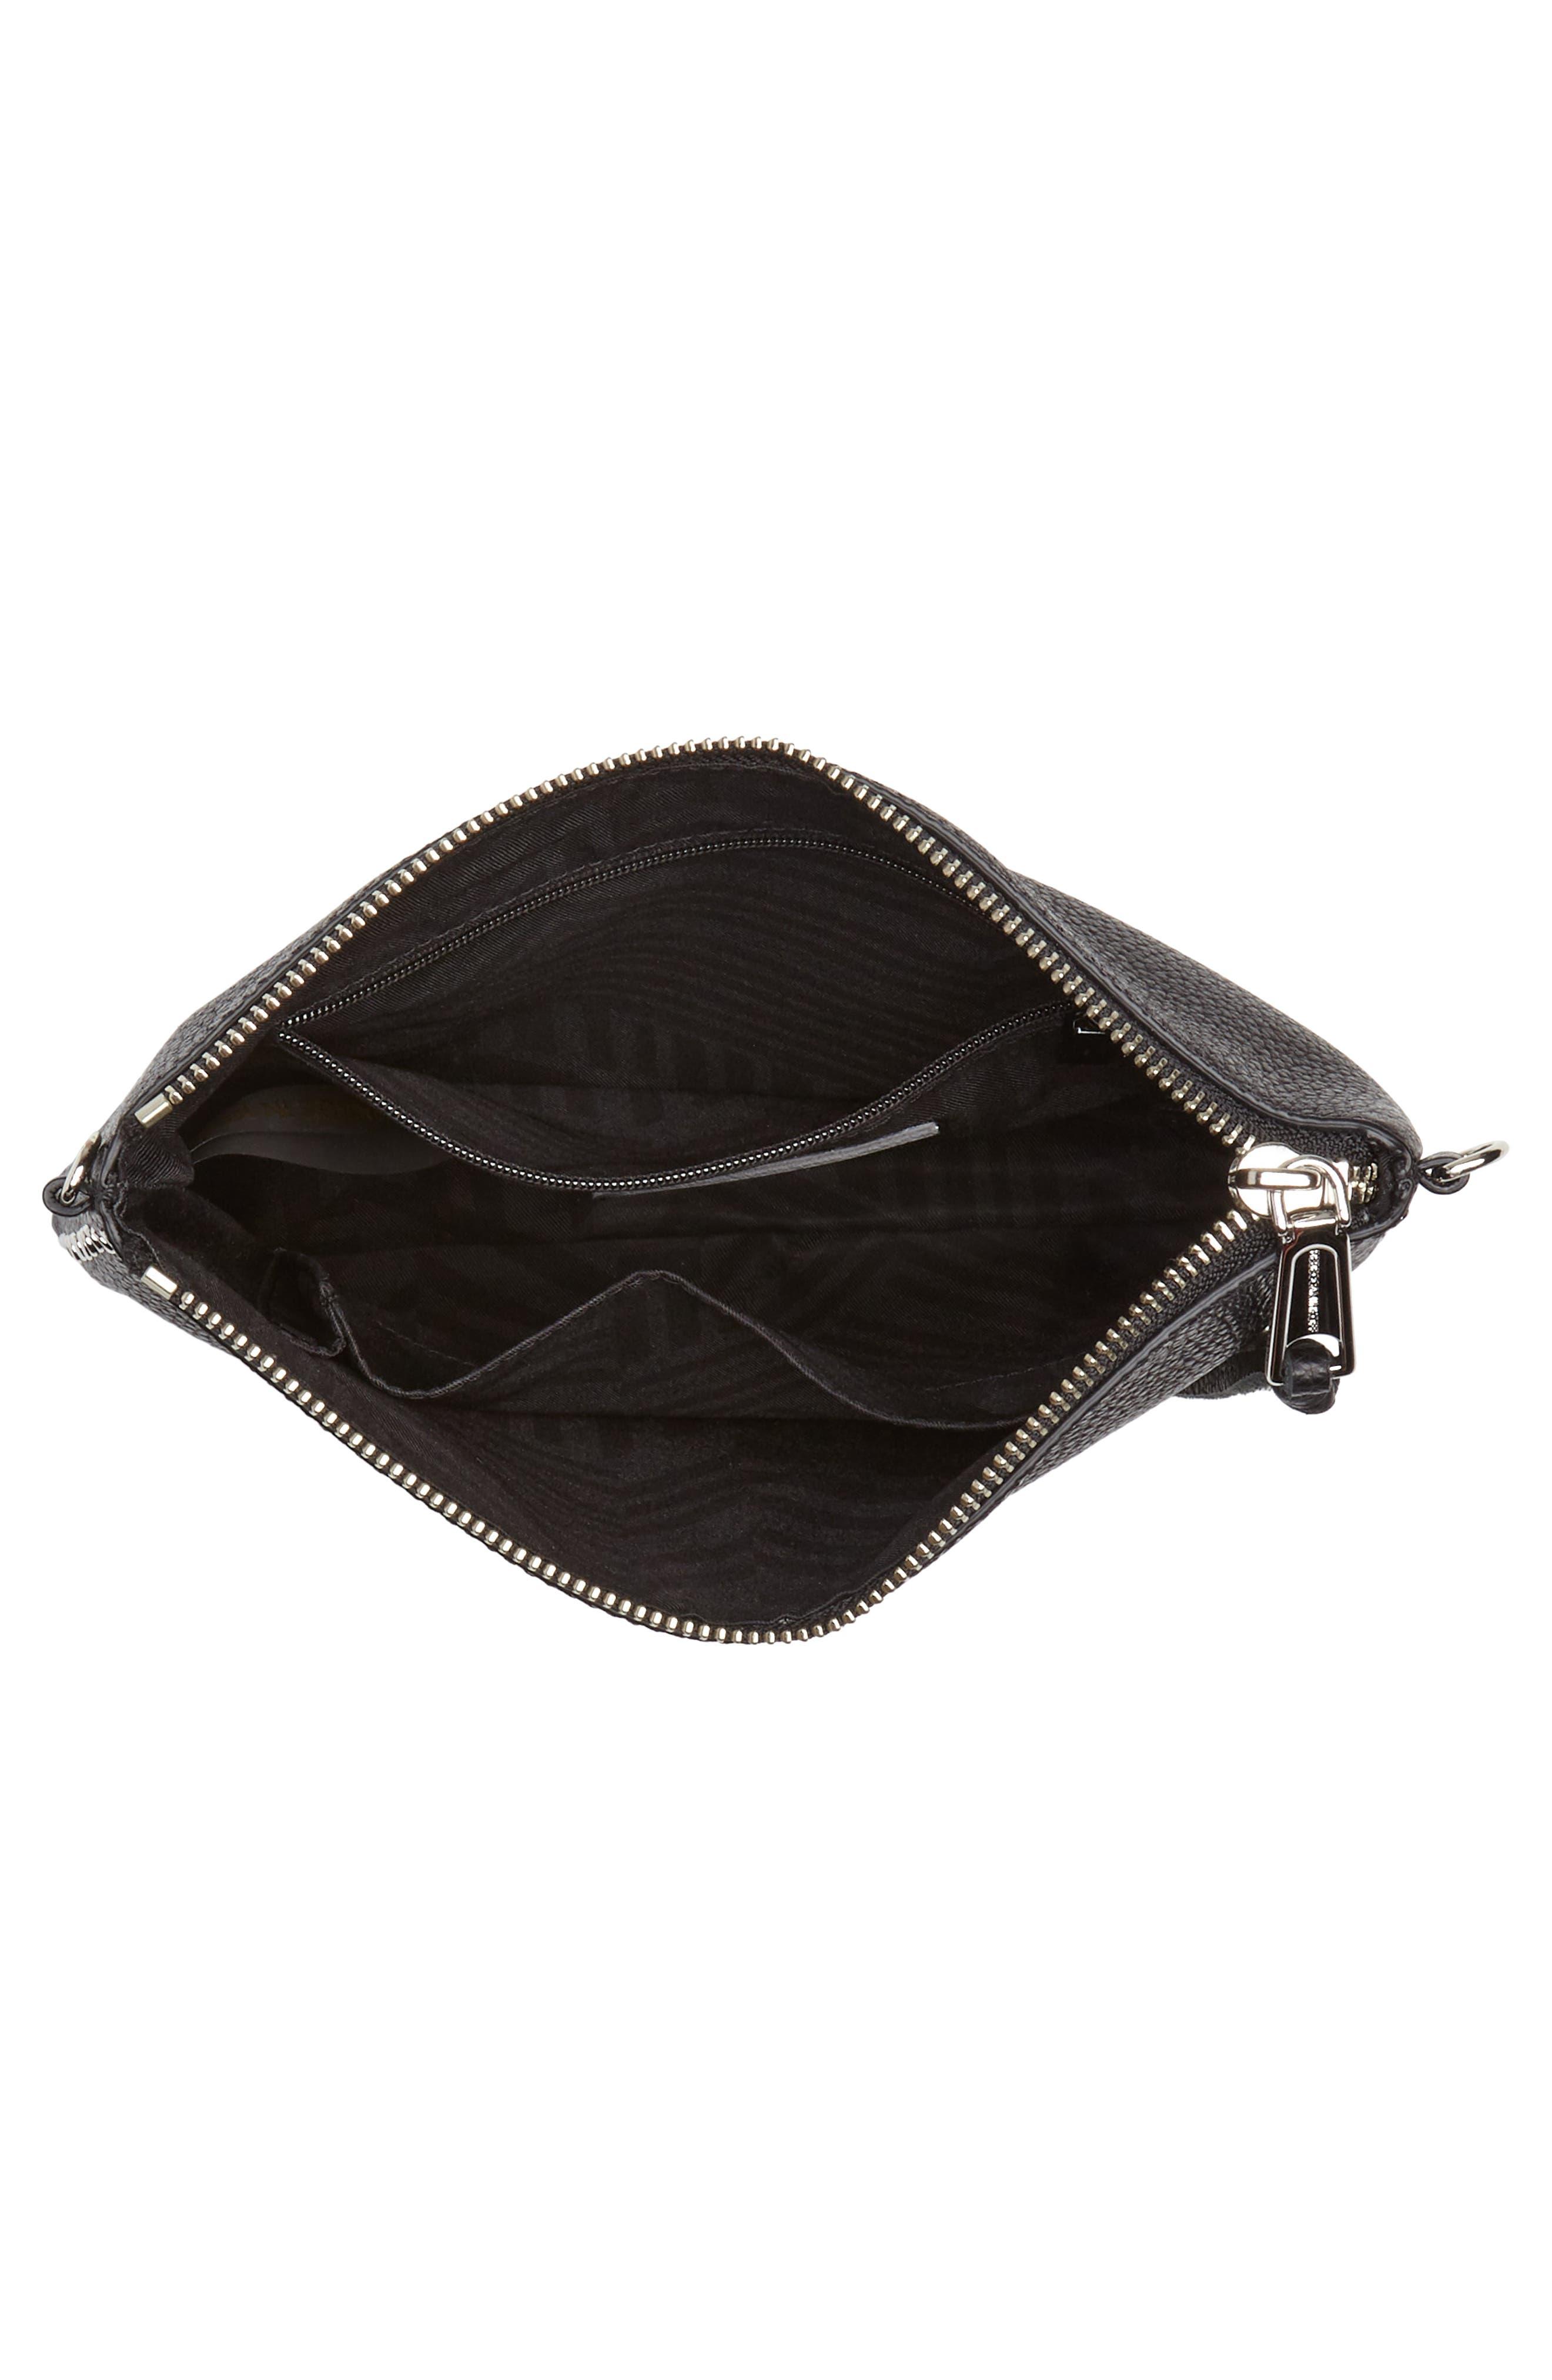 Jon Studded Leather Crossbody Bag,                             Alternate thumbnail 4, color,                             001